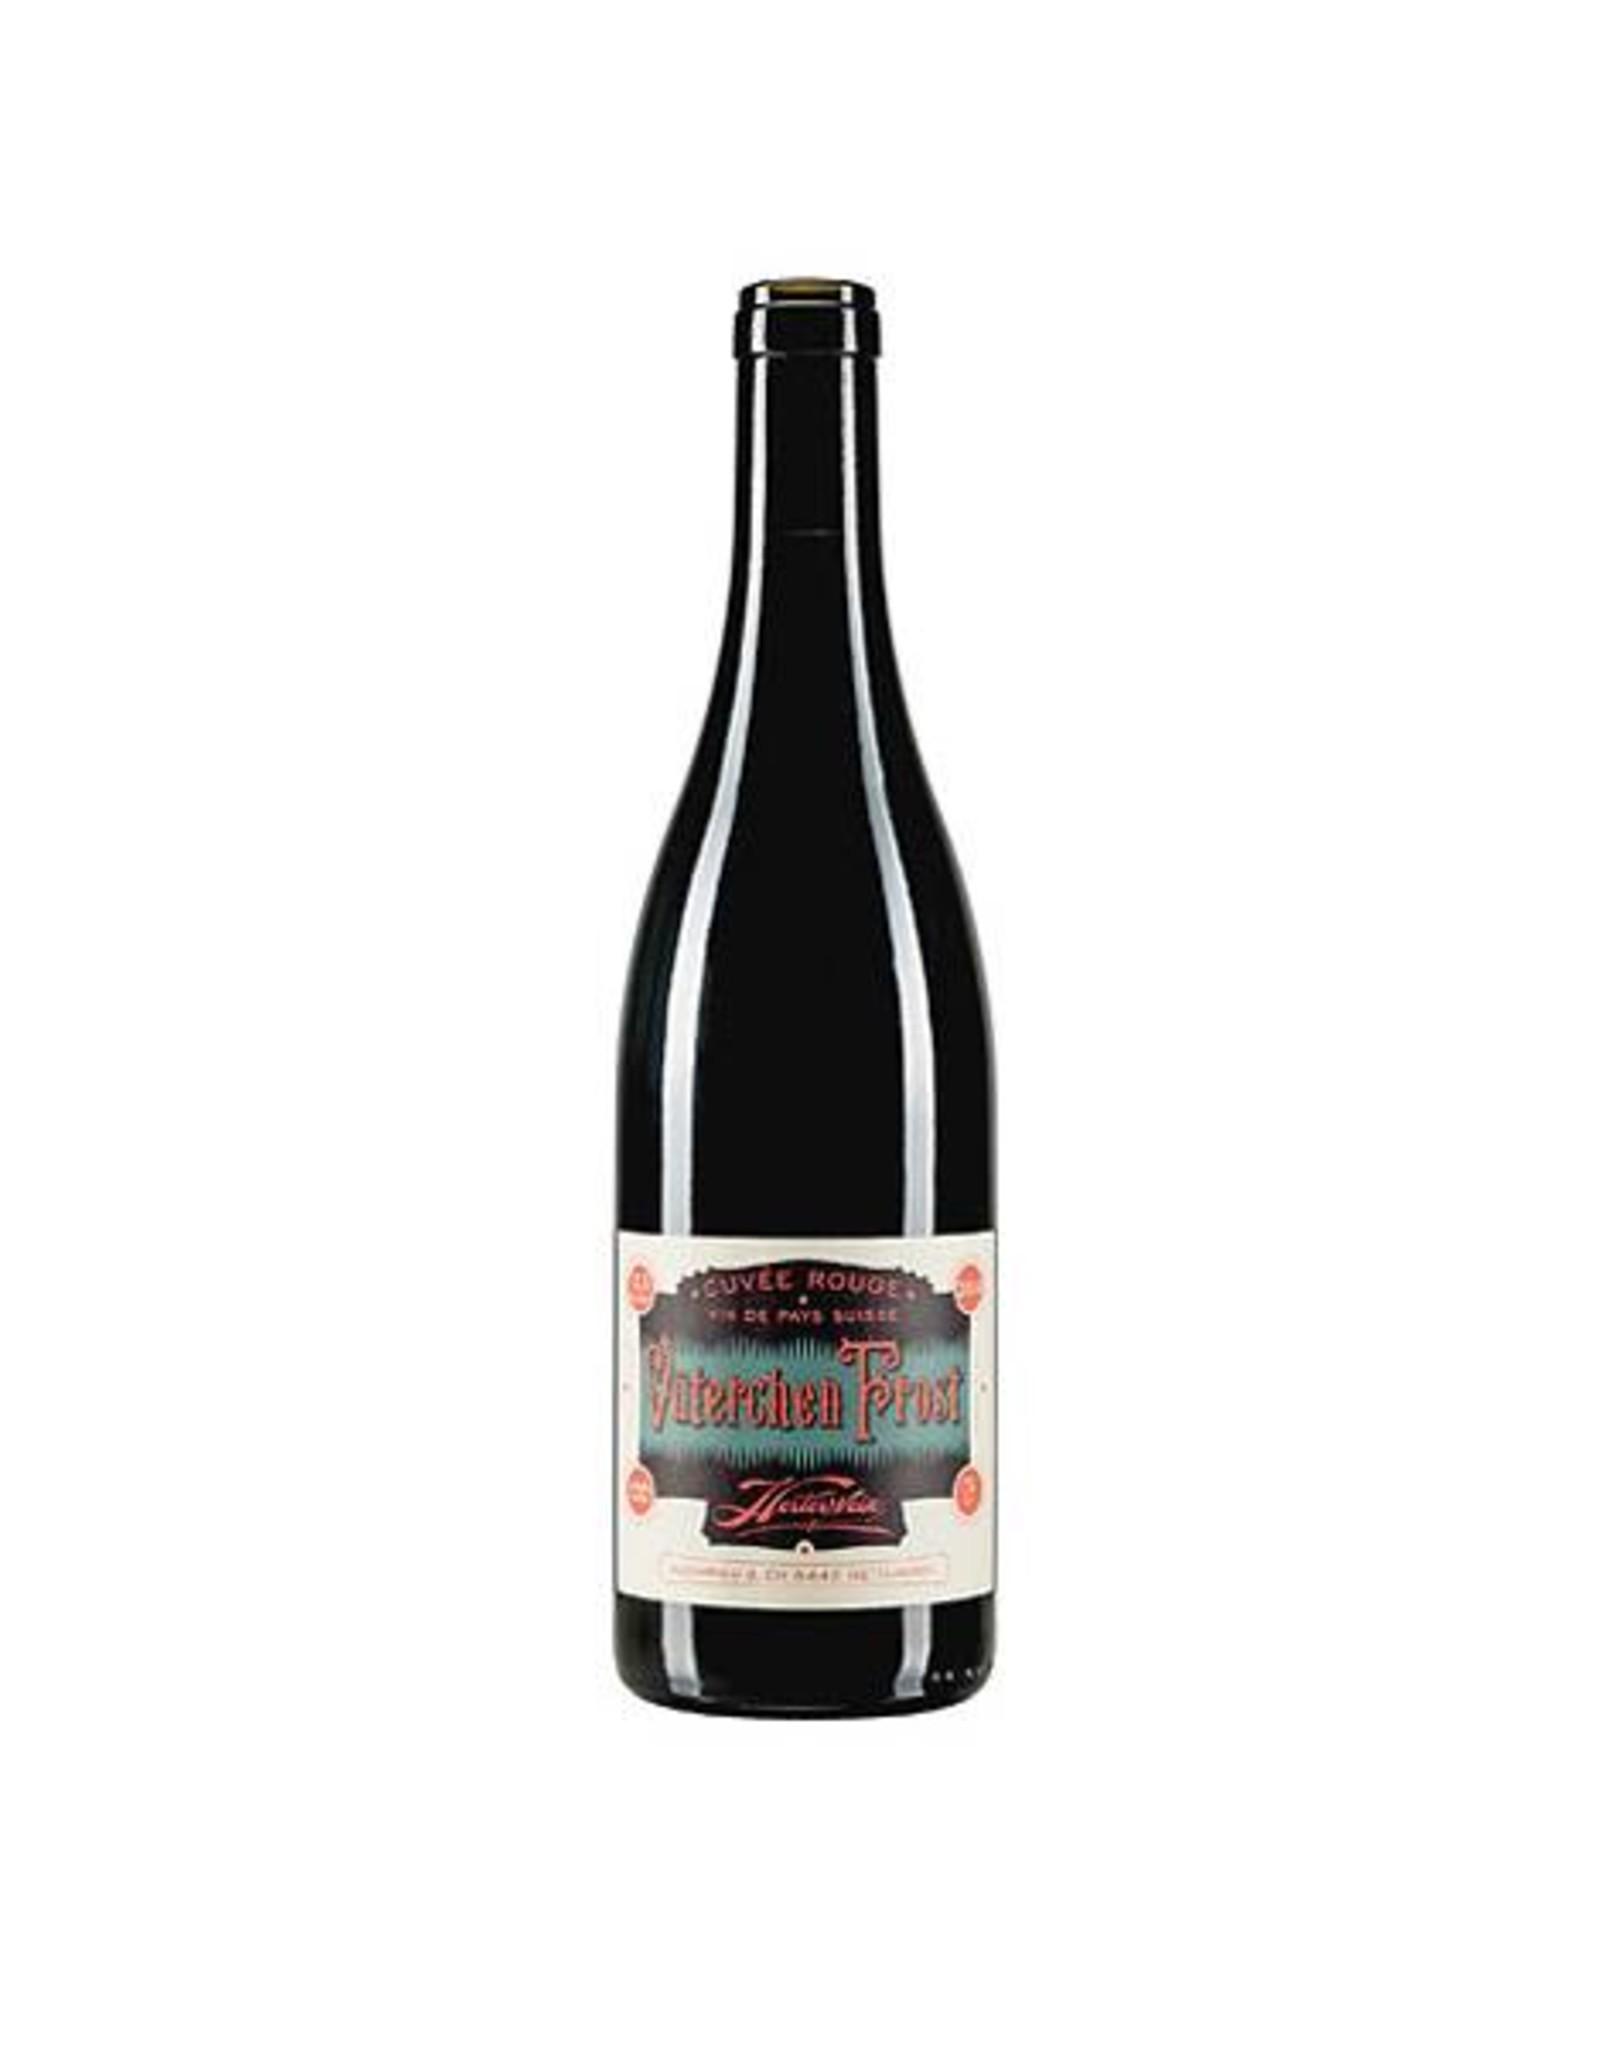 Herterwein, Vin de Pays Suisse, Väterchen Frost Cuvée Rouge